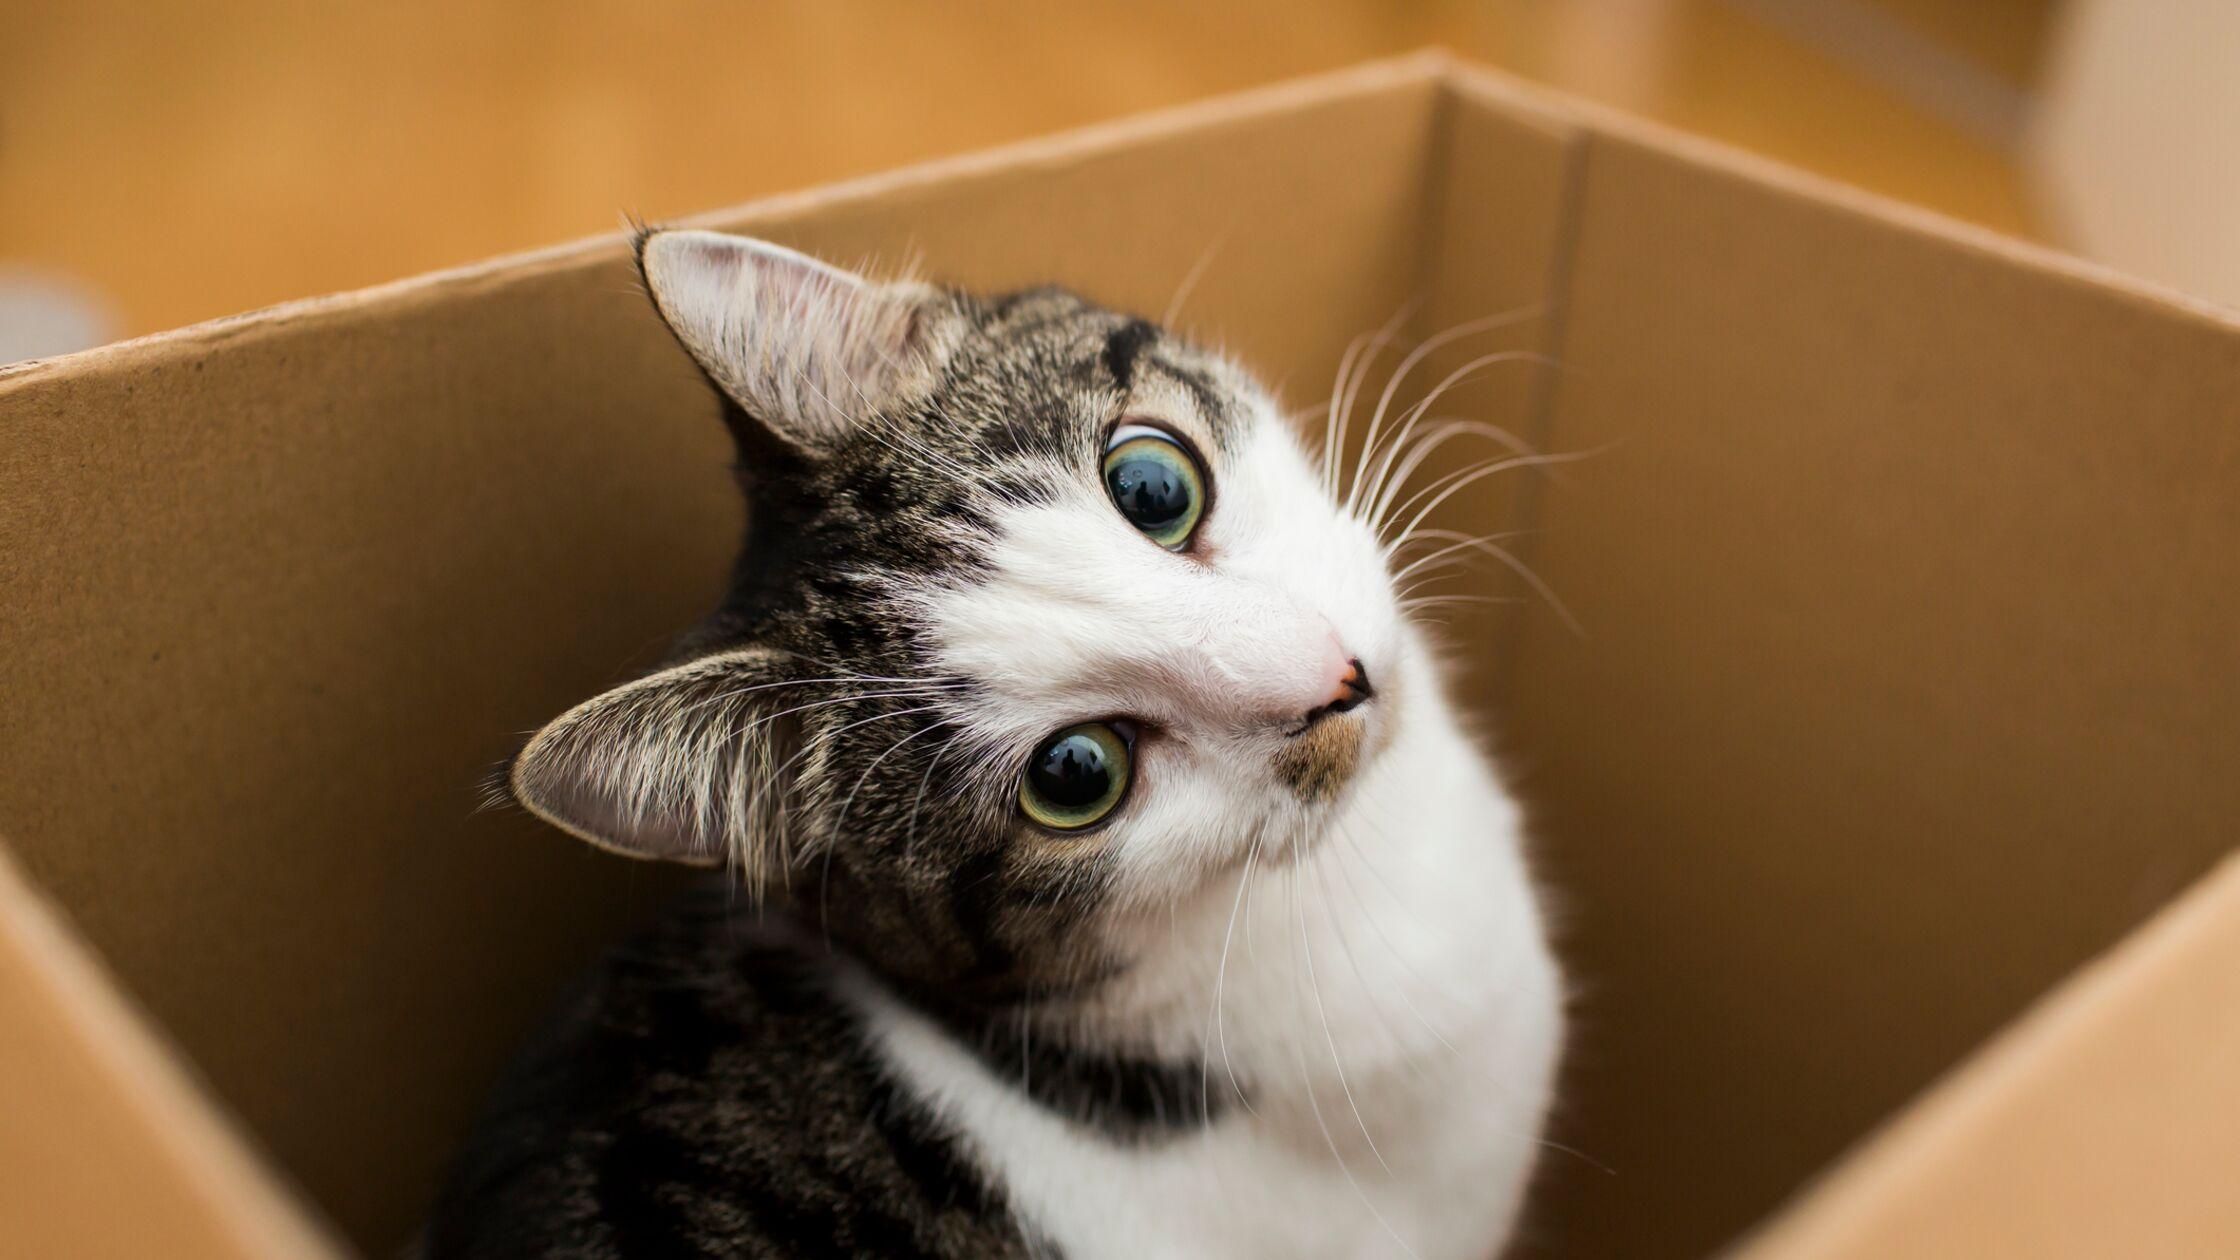 Katze an neues Zuhause gewöhnen: Das hilft nach dem Umzug